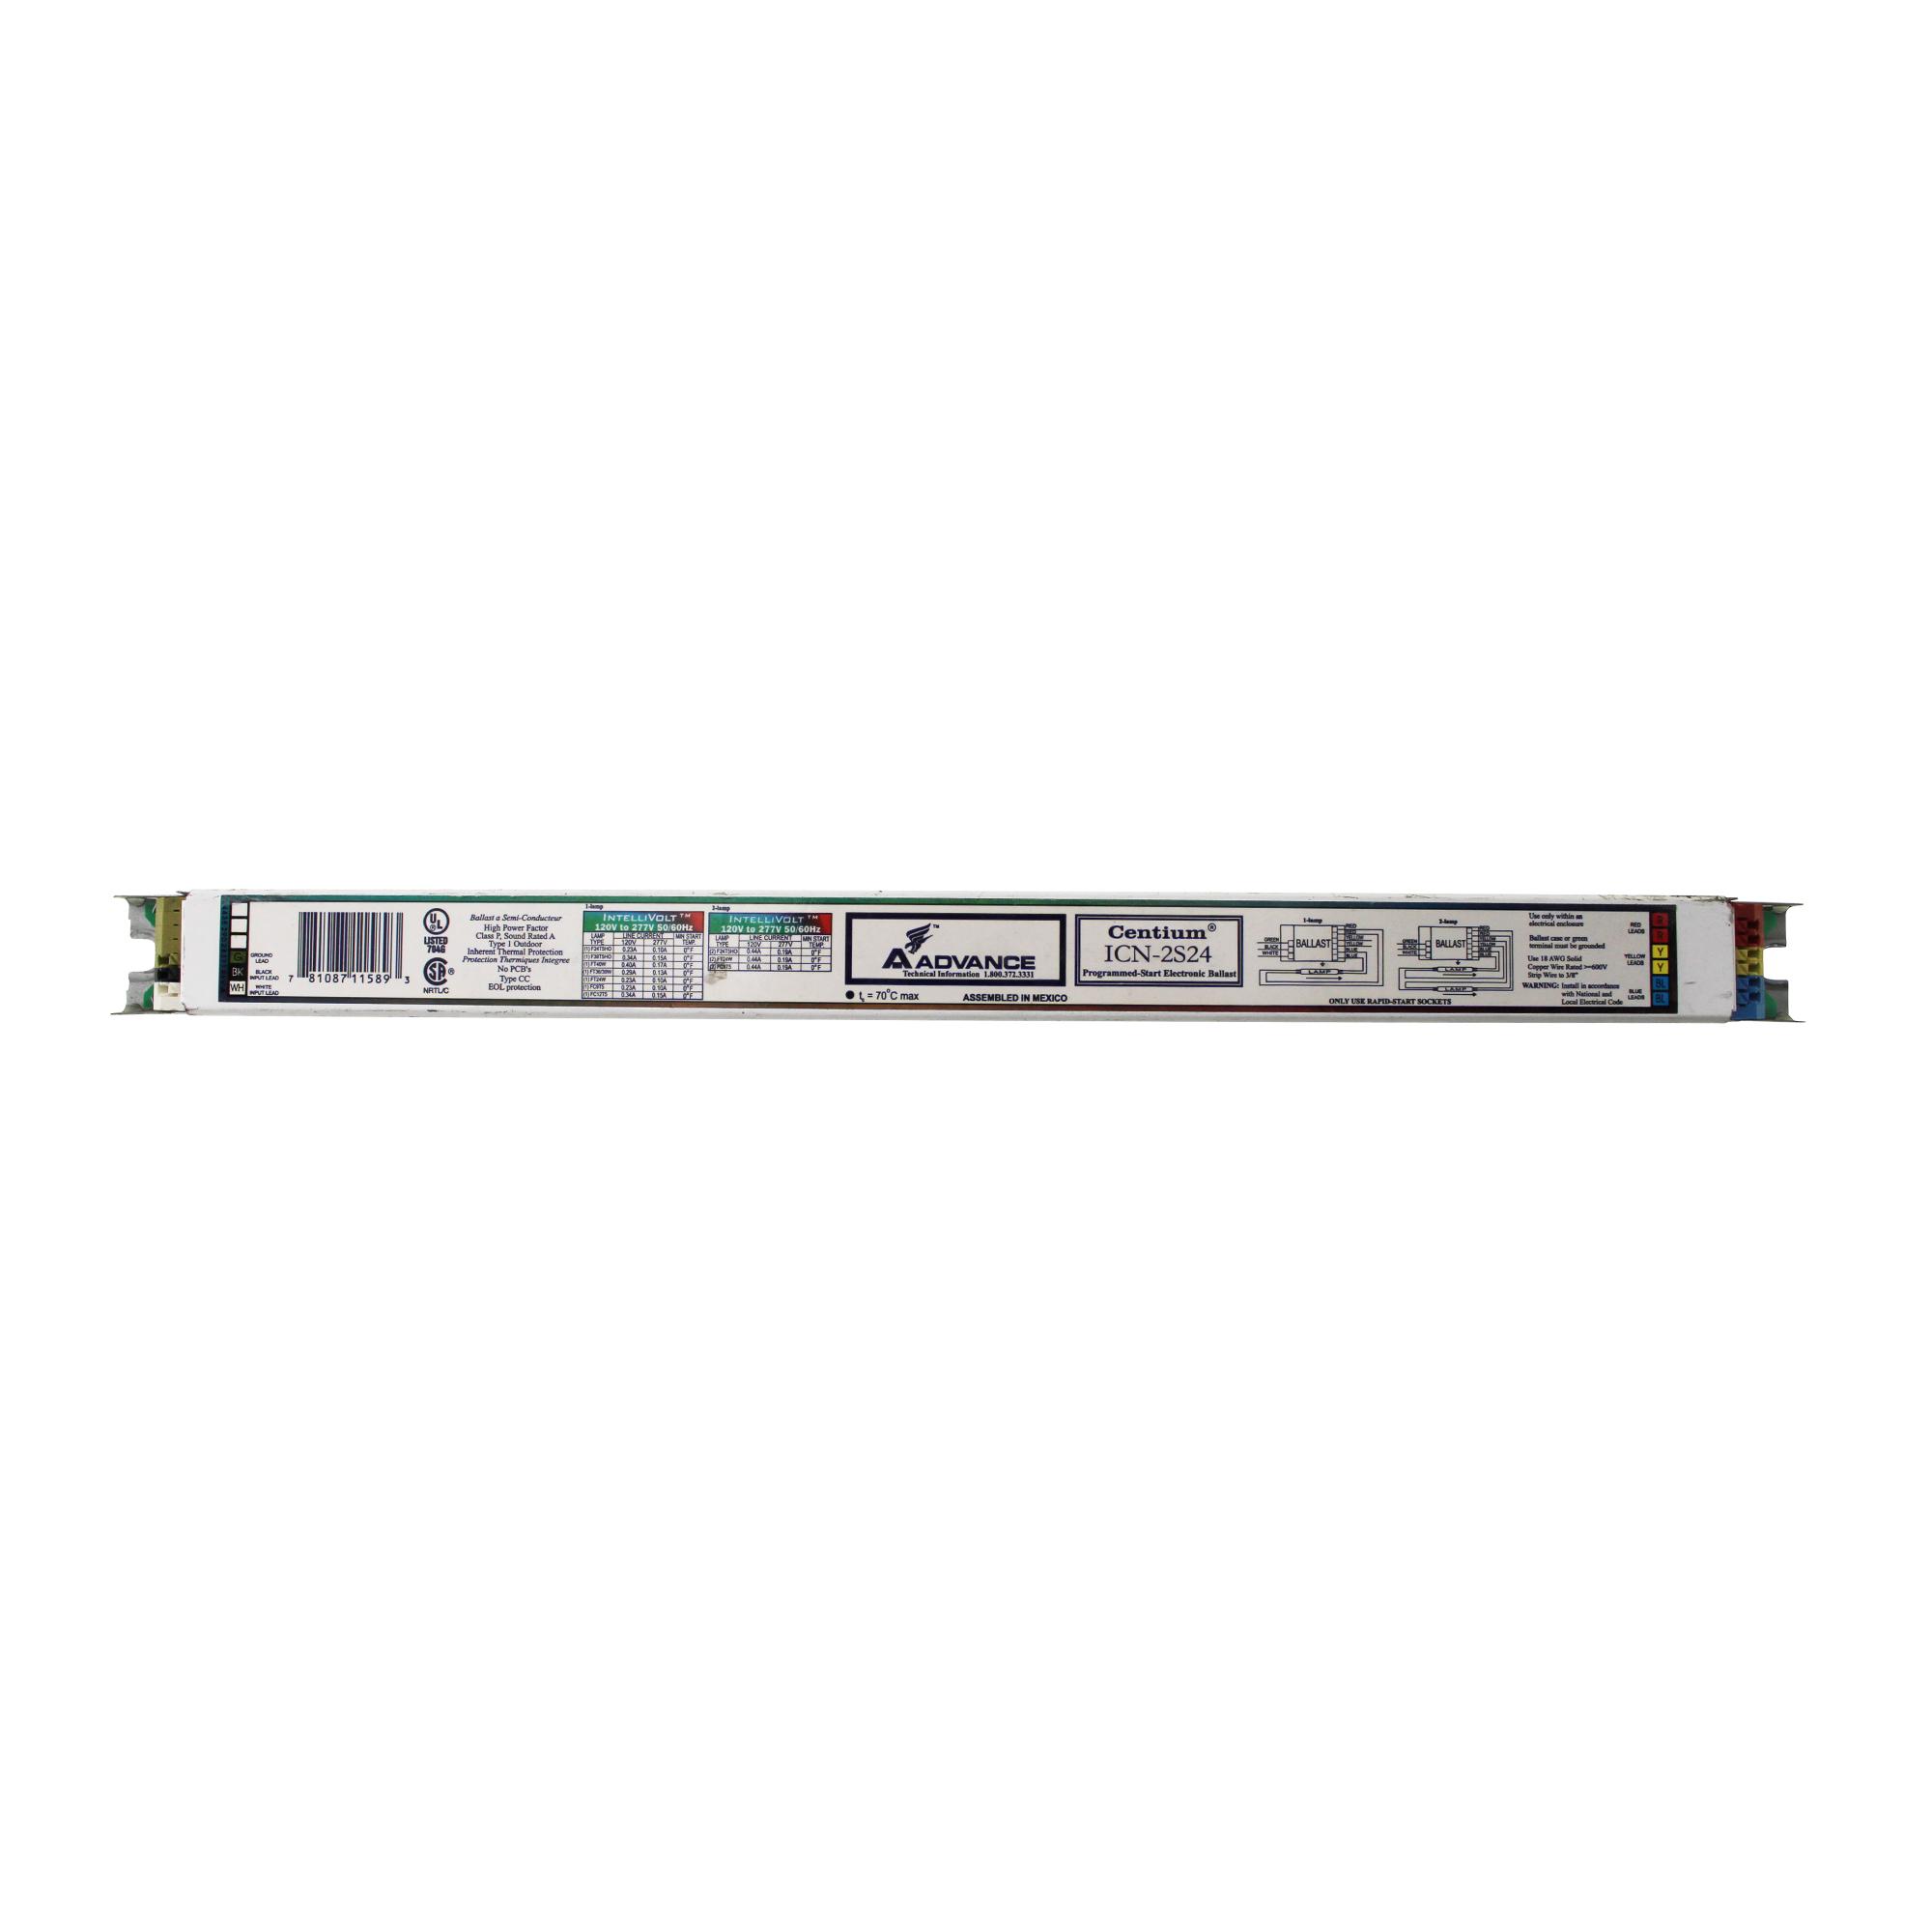 Philips Advance ICN-2S24 Electronic Fluorescent Ballast, ...